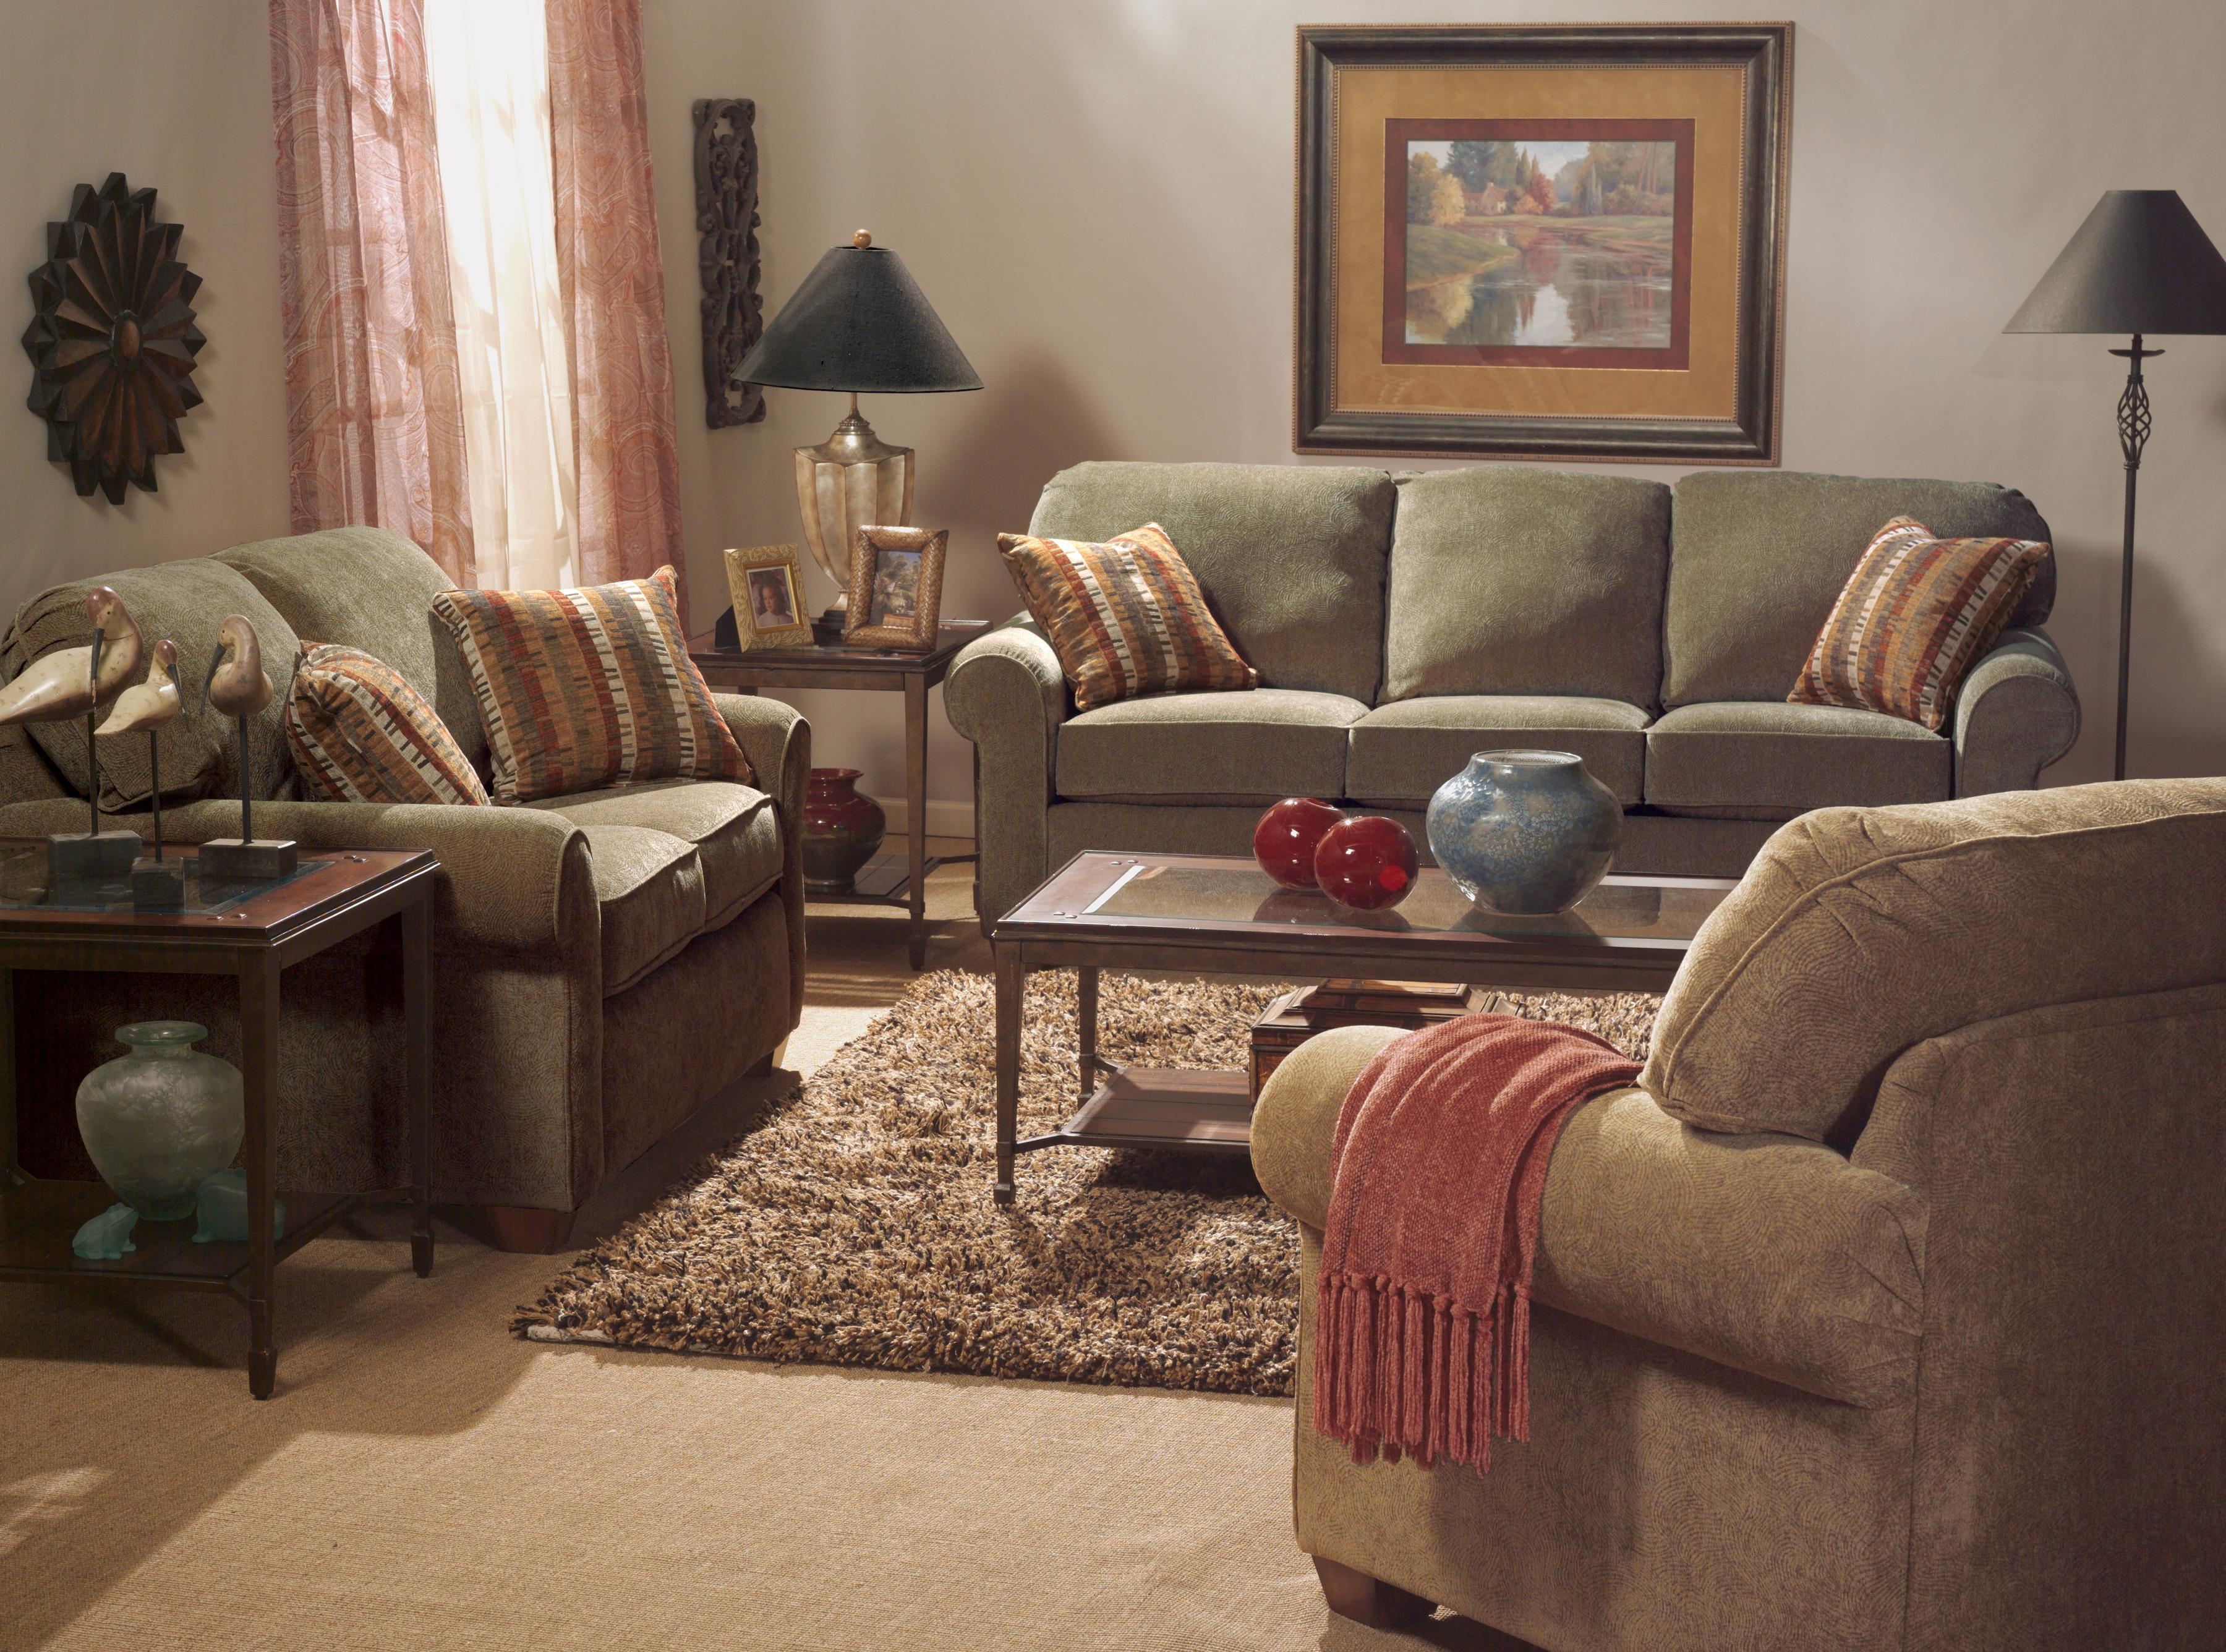 Flexsteel thornton sofa price flexsteel thornton sofa for Wayside furniture